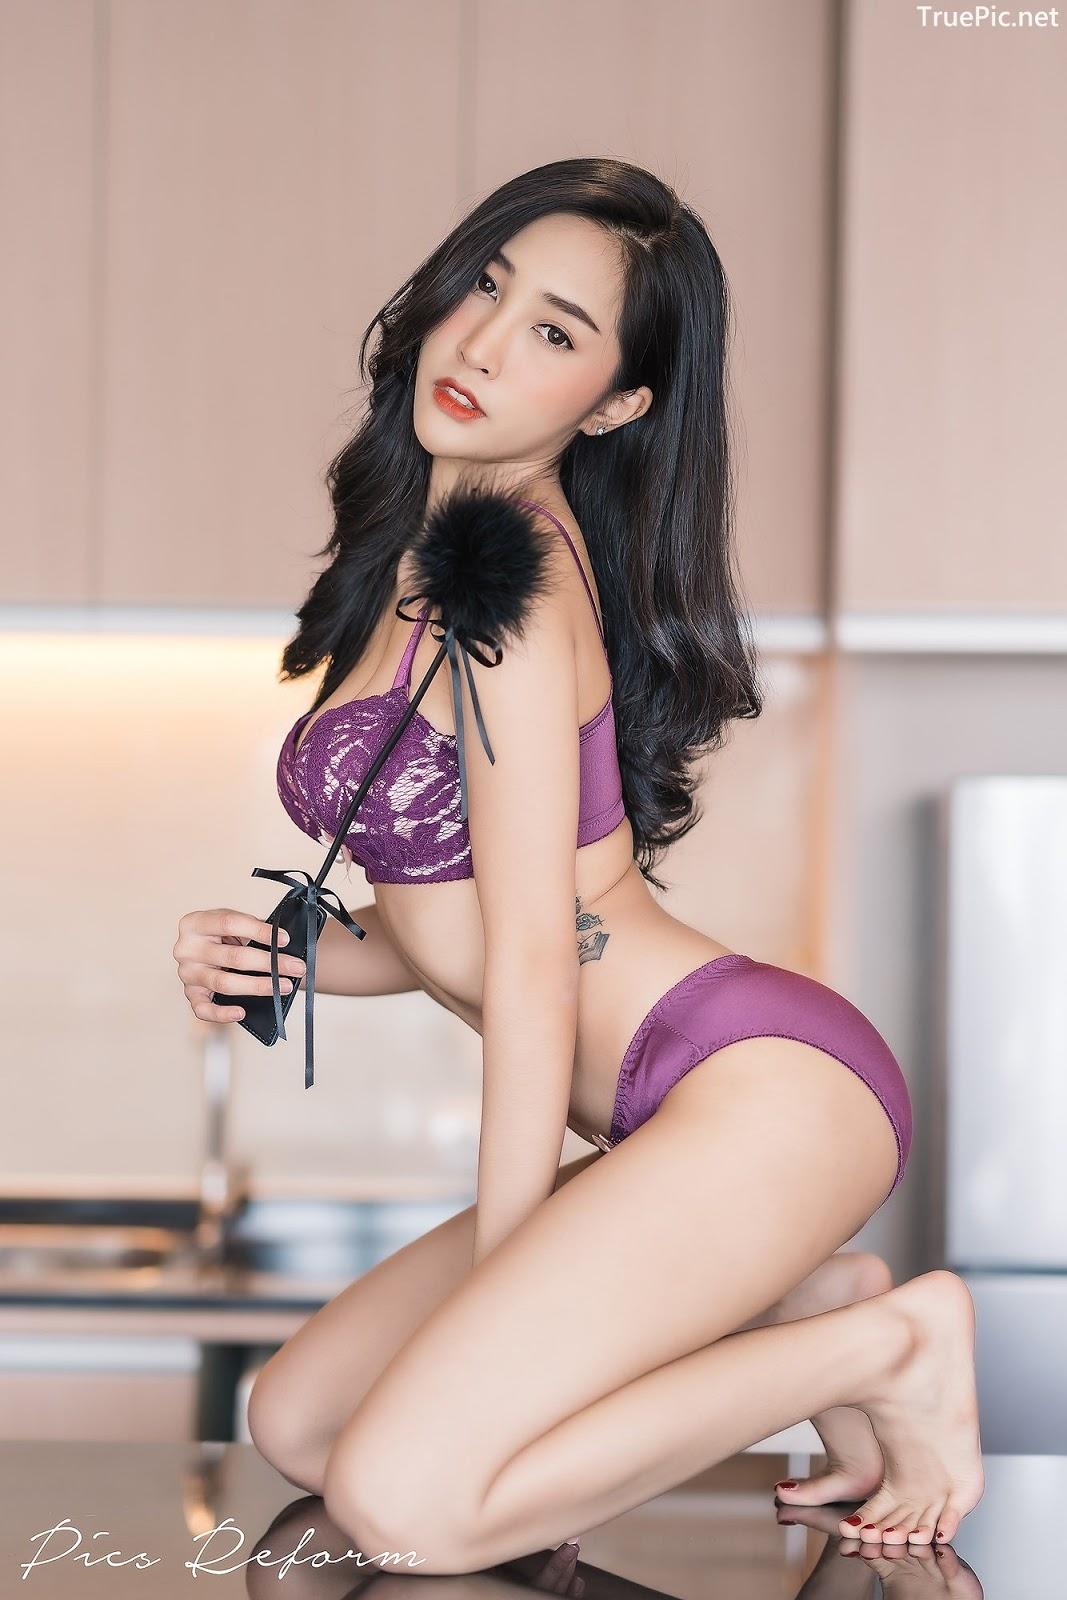 Image-Thailand-Sexy-Model-Yanapat-Ukkararujipat-Violet-Girl-TruePic.net- Picture-1